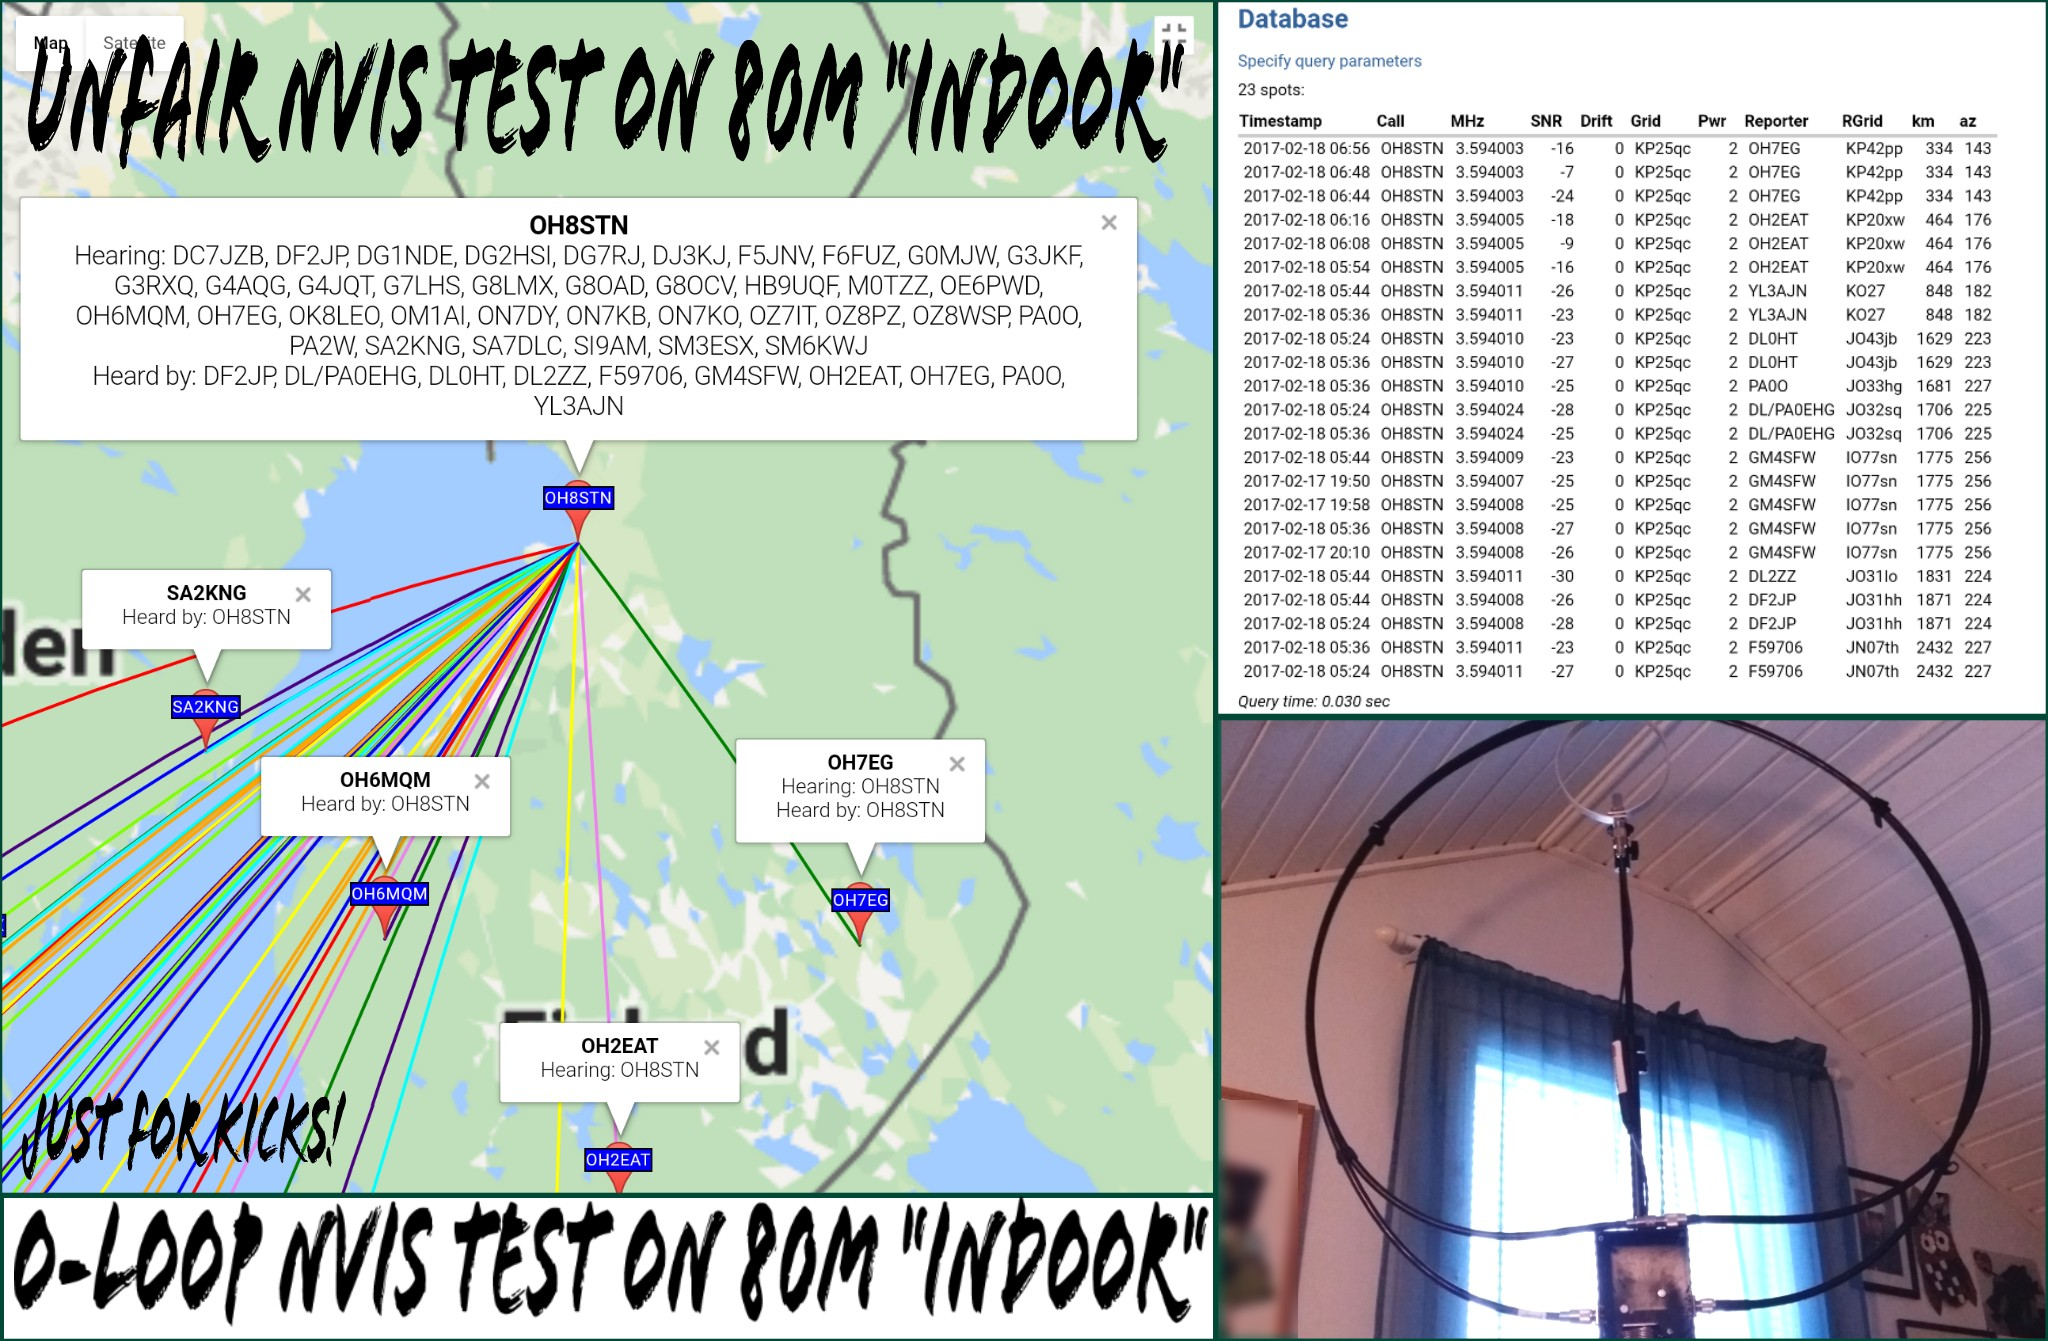 O-Loop 80m NVIS test